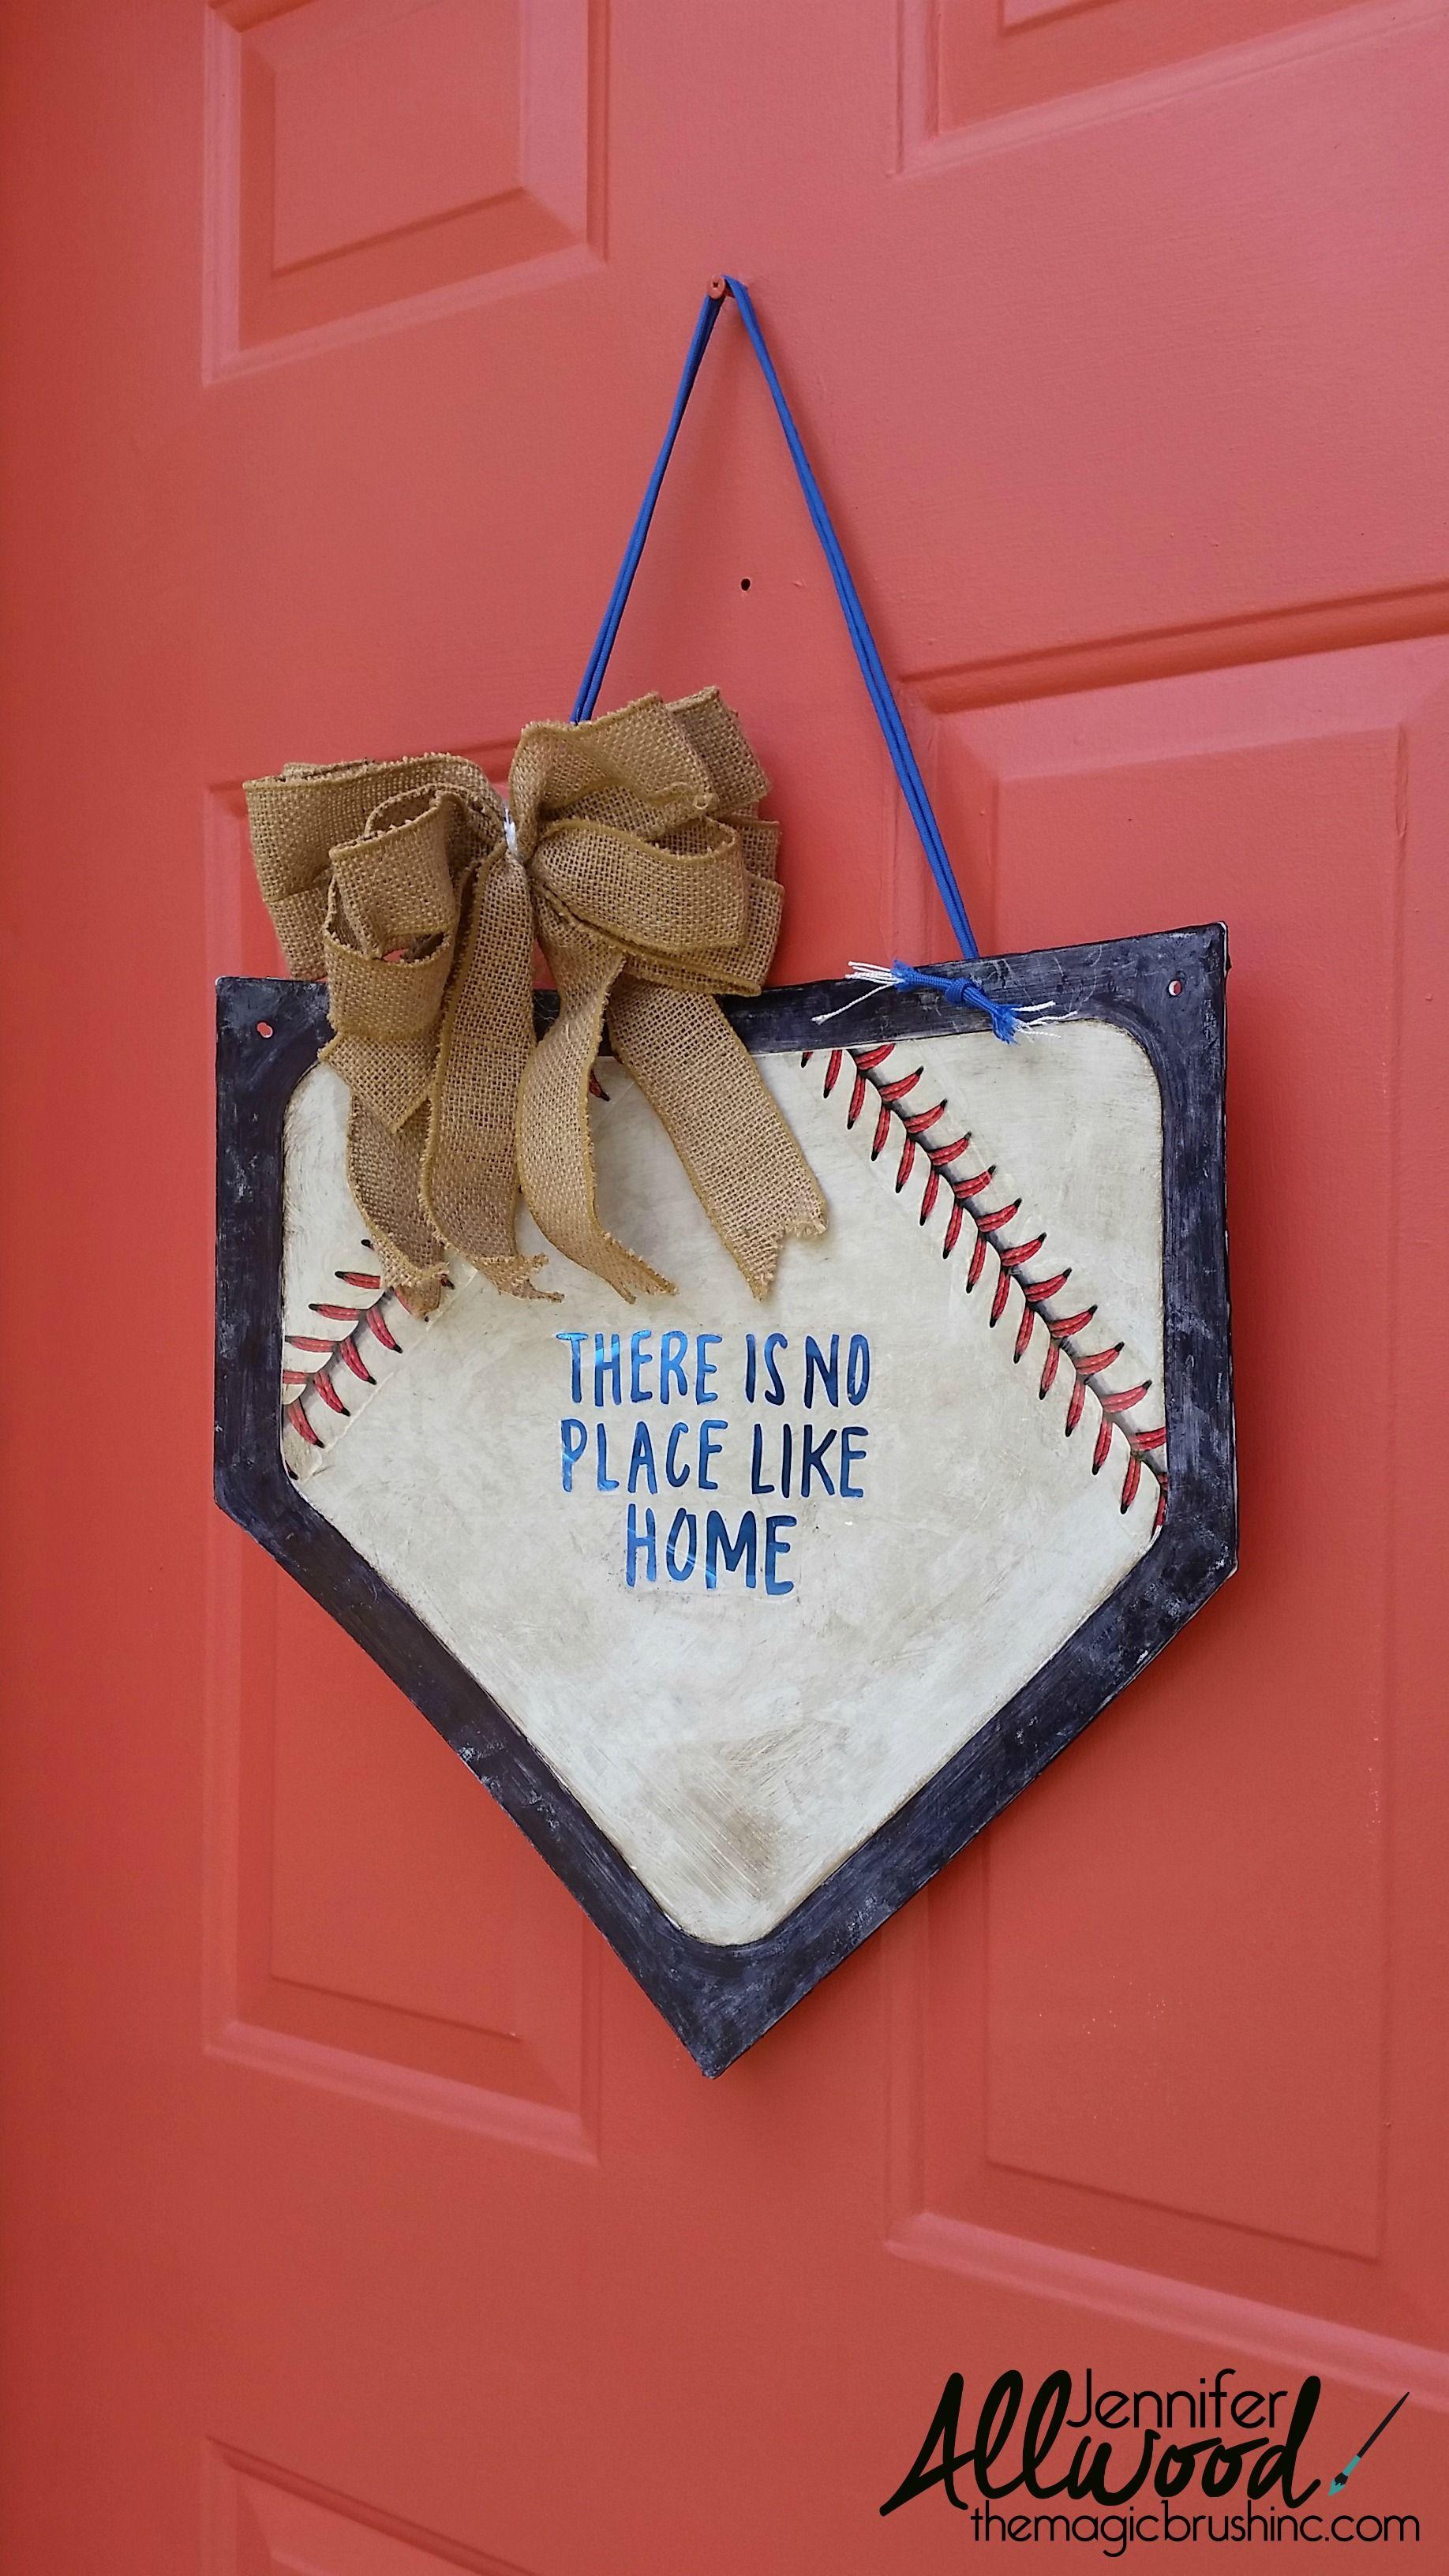 Lovely Baseball Home Plate Door Hanging Decoration...Jennifer Allwood The Magic  Brush Inc.